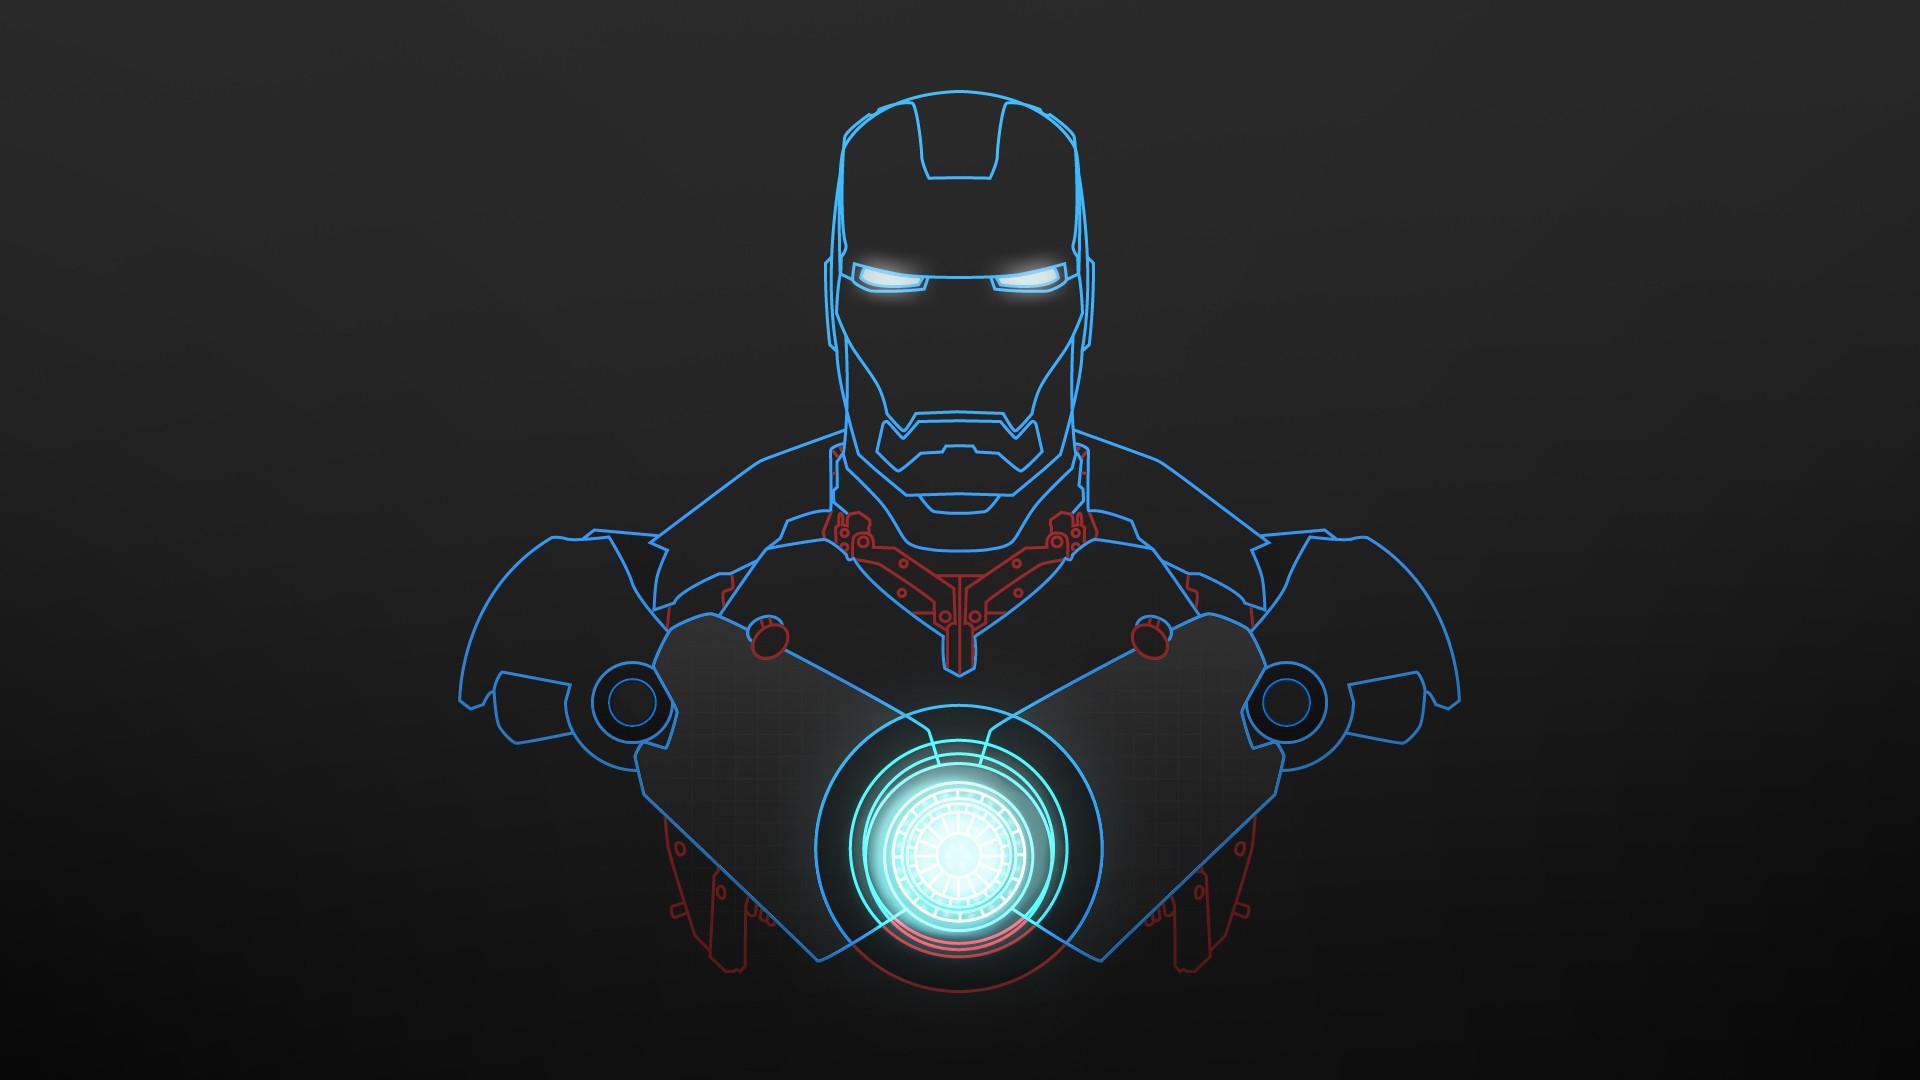 3d Wallpaper Iron Man Wallpaper Blue Sketch Hd Desktop Wallpapers 4k Hd